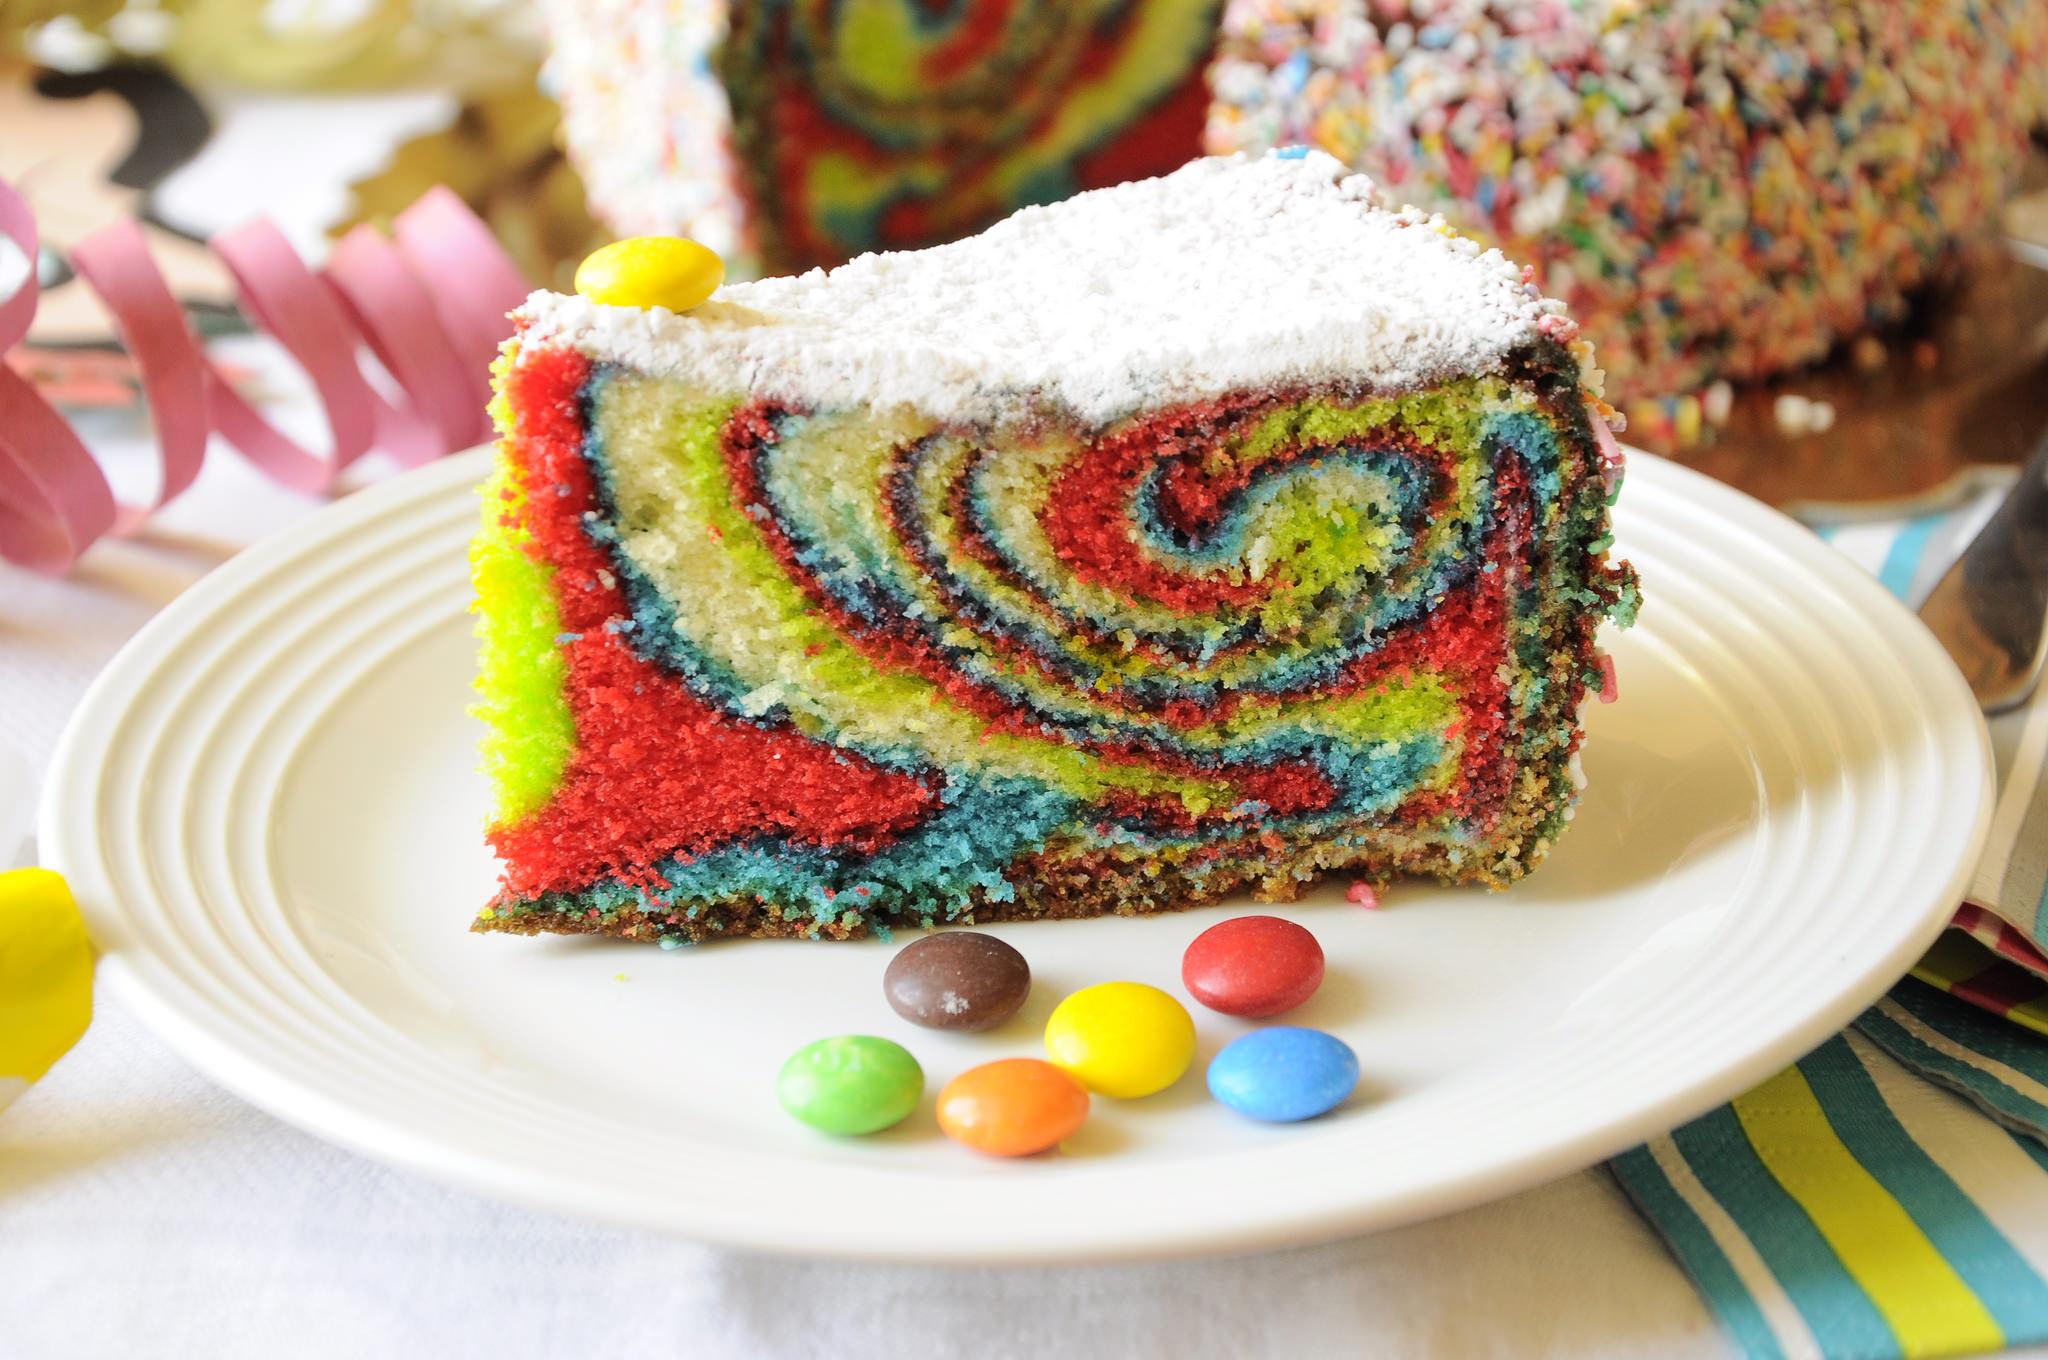 Torta arlecchino bimby tm31 tm5 for Ricette bimby torte